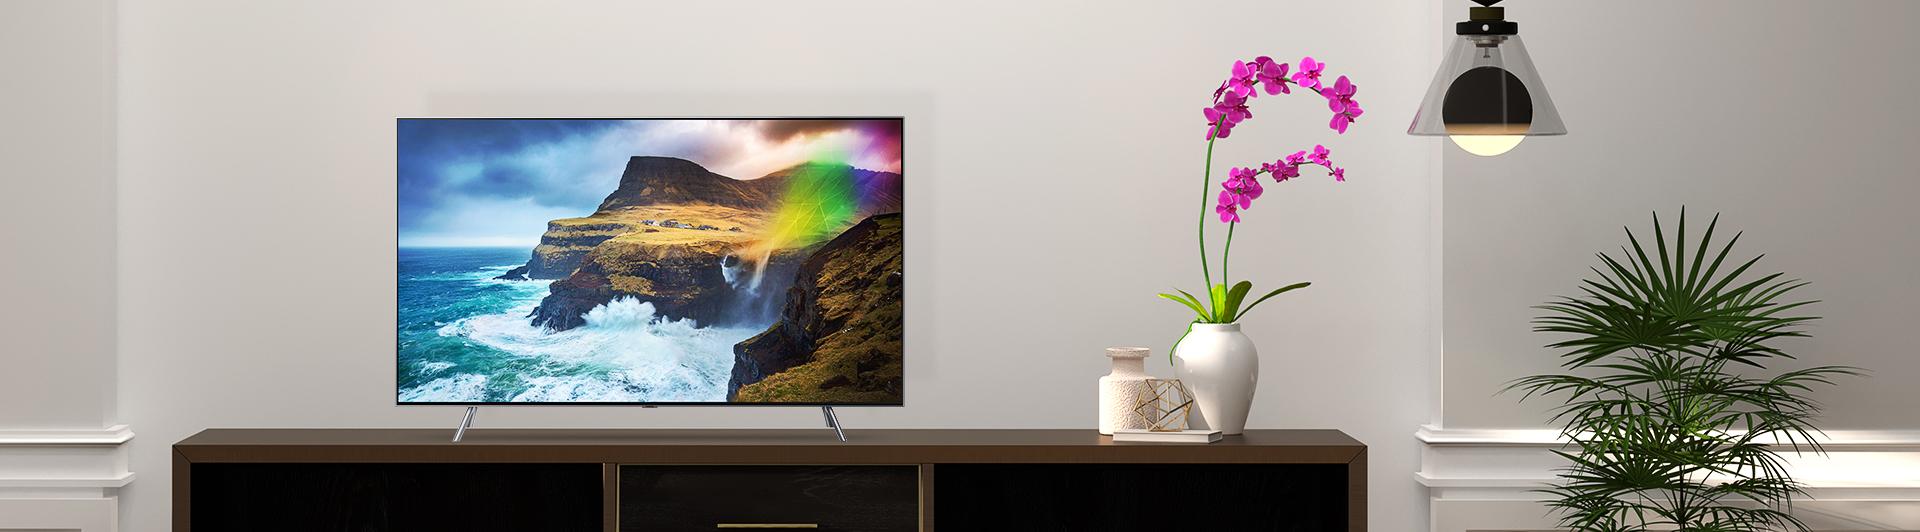 TV QLED SAMSUNG 65 INCH QA65Q75RAKXXV